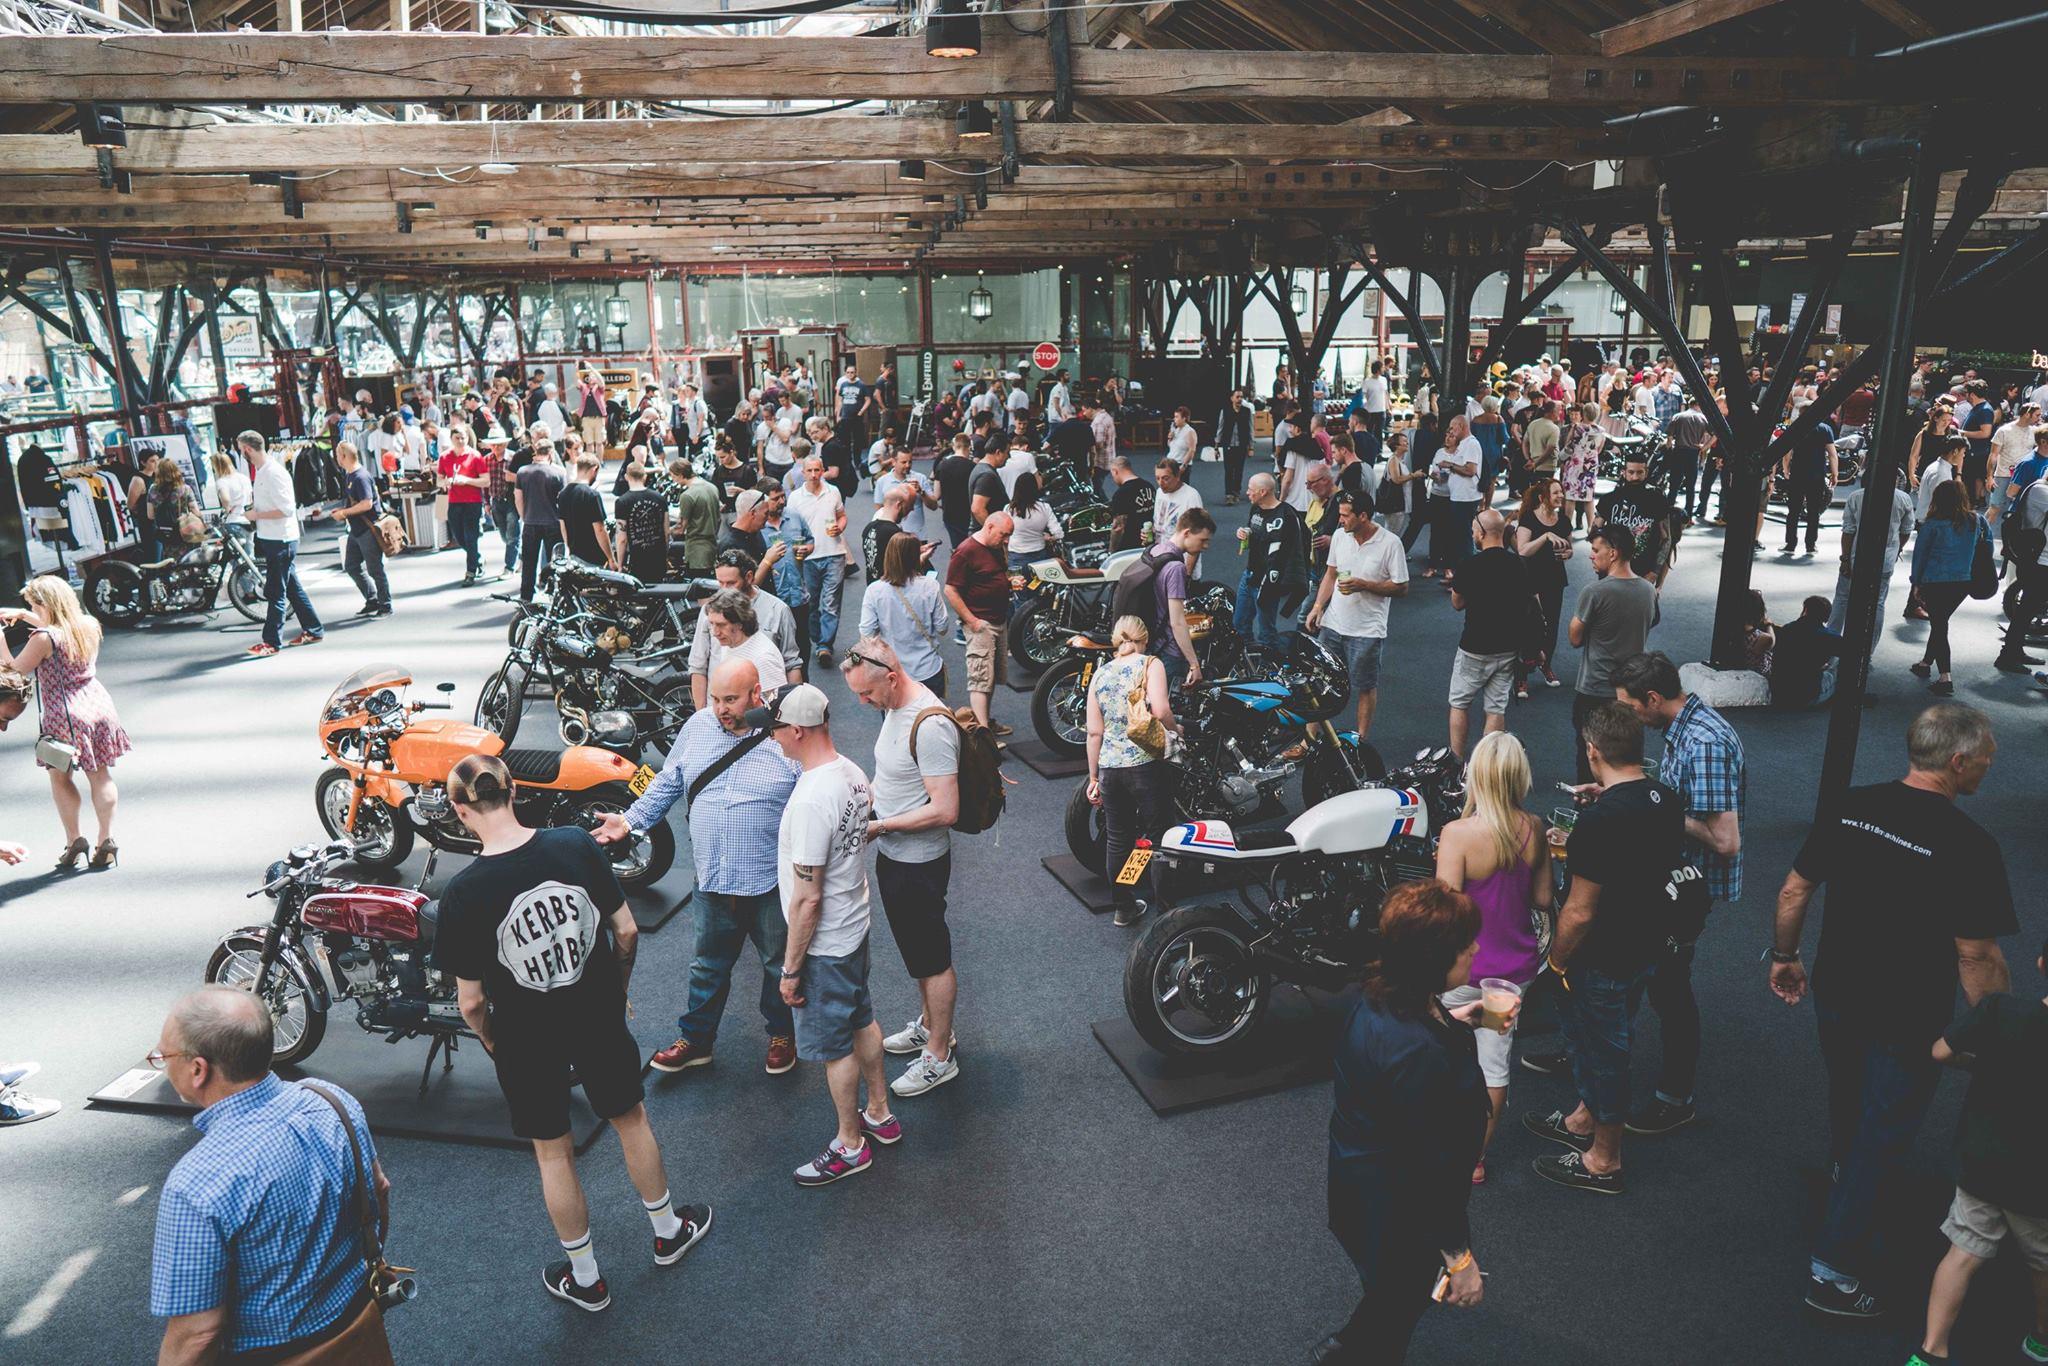 Bike Shed crowd